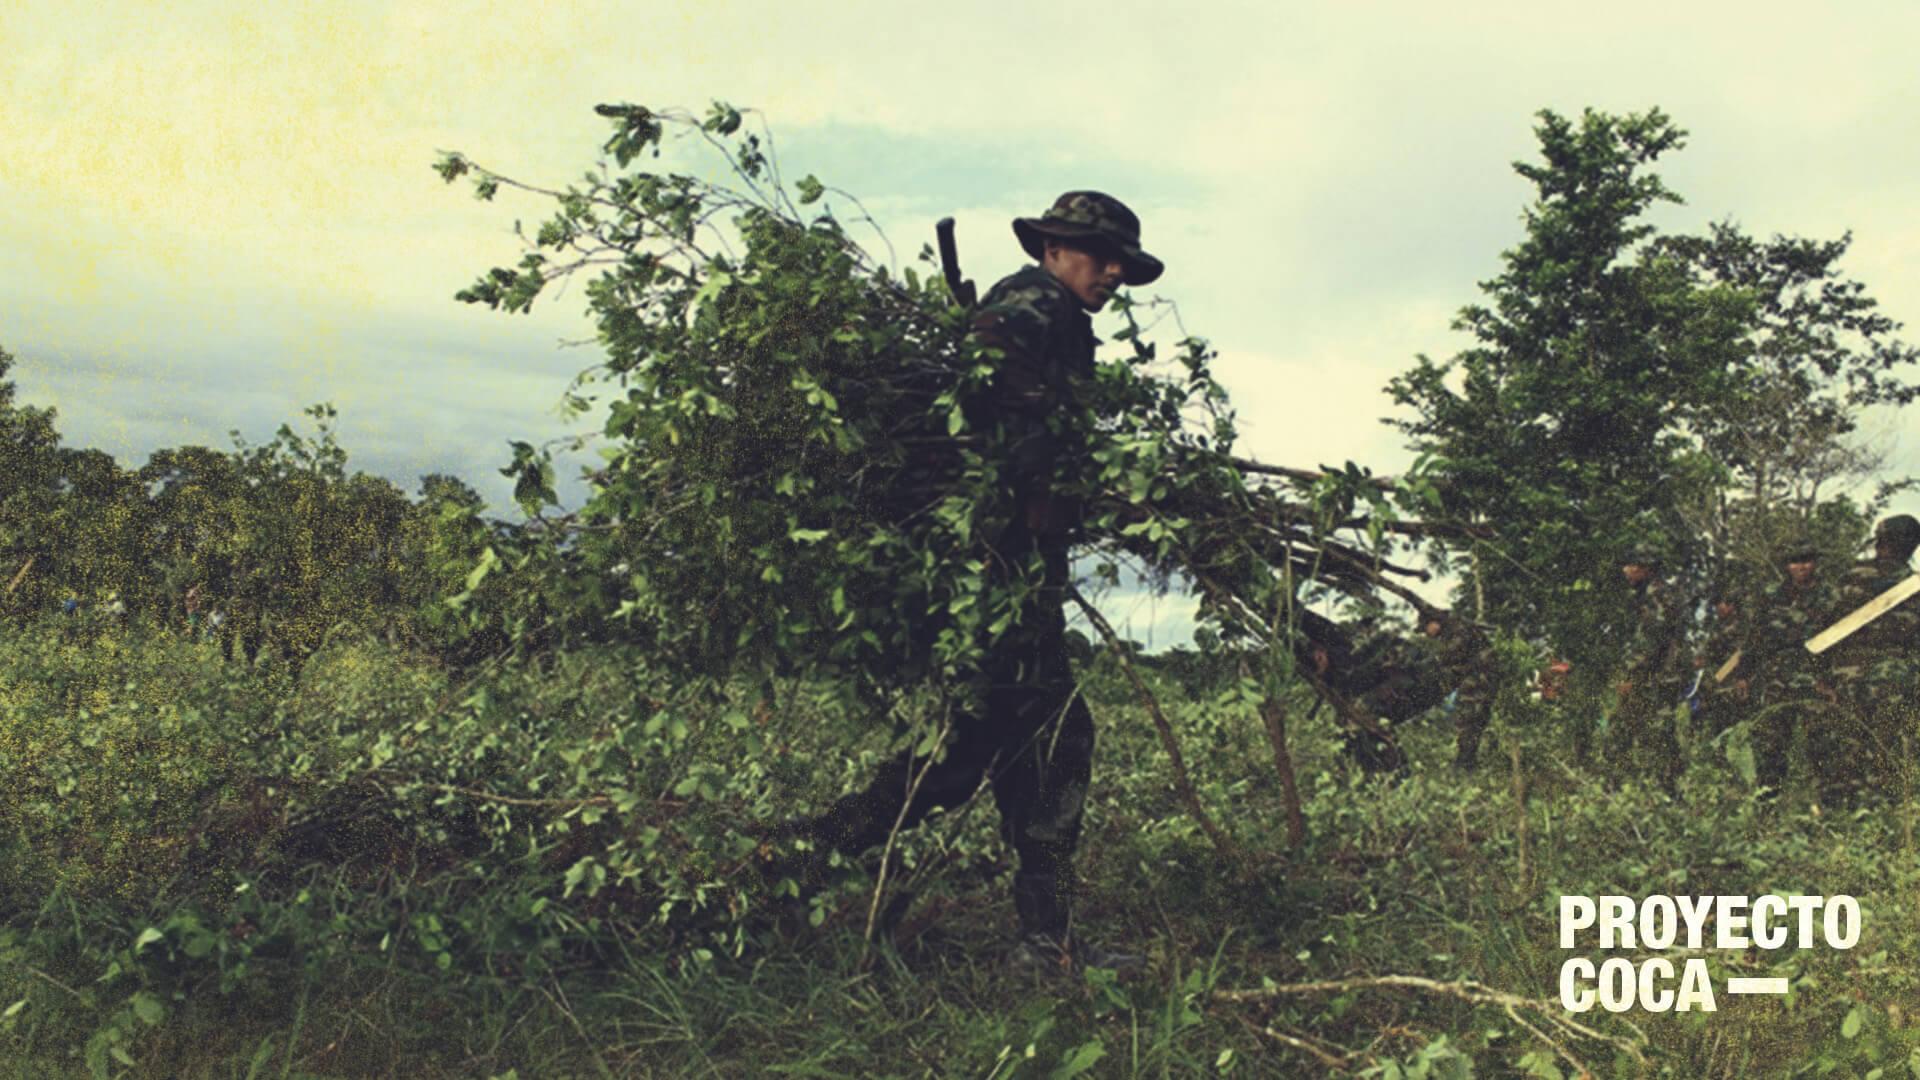 Tumaco, capital mundial de la coca: 5 razones del problema